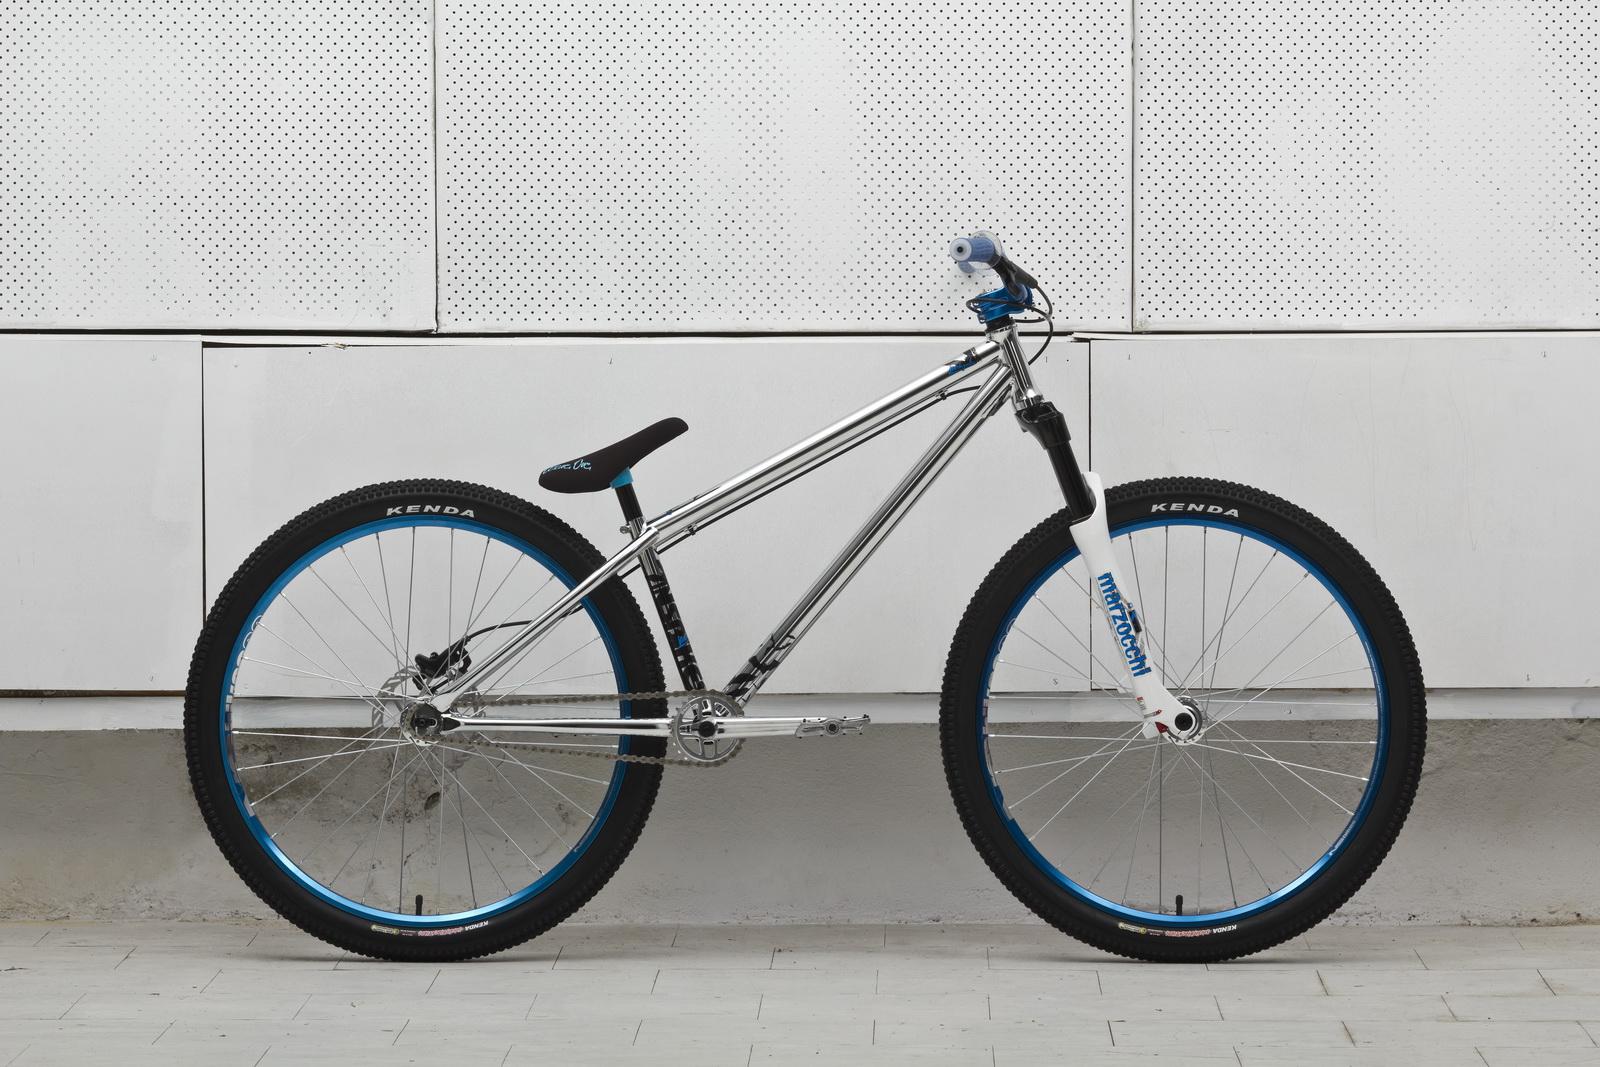 Drag Racing Helmets >> NS Bikes Metropolis 1 2012 - ns-bikes - Mountain Biking Pictures - Vital MTB